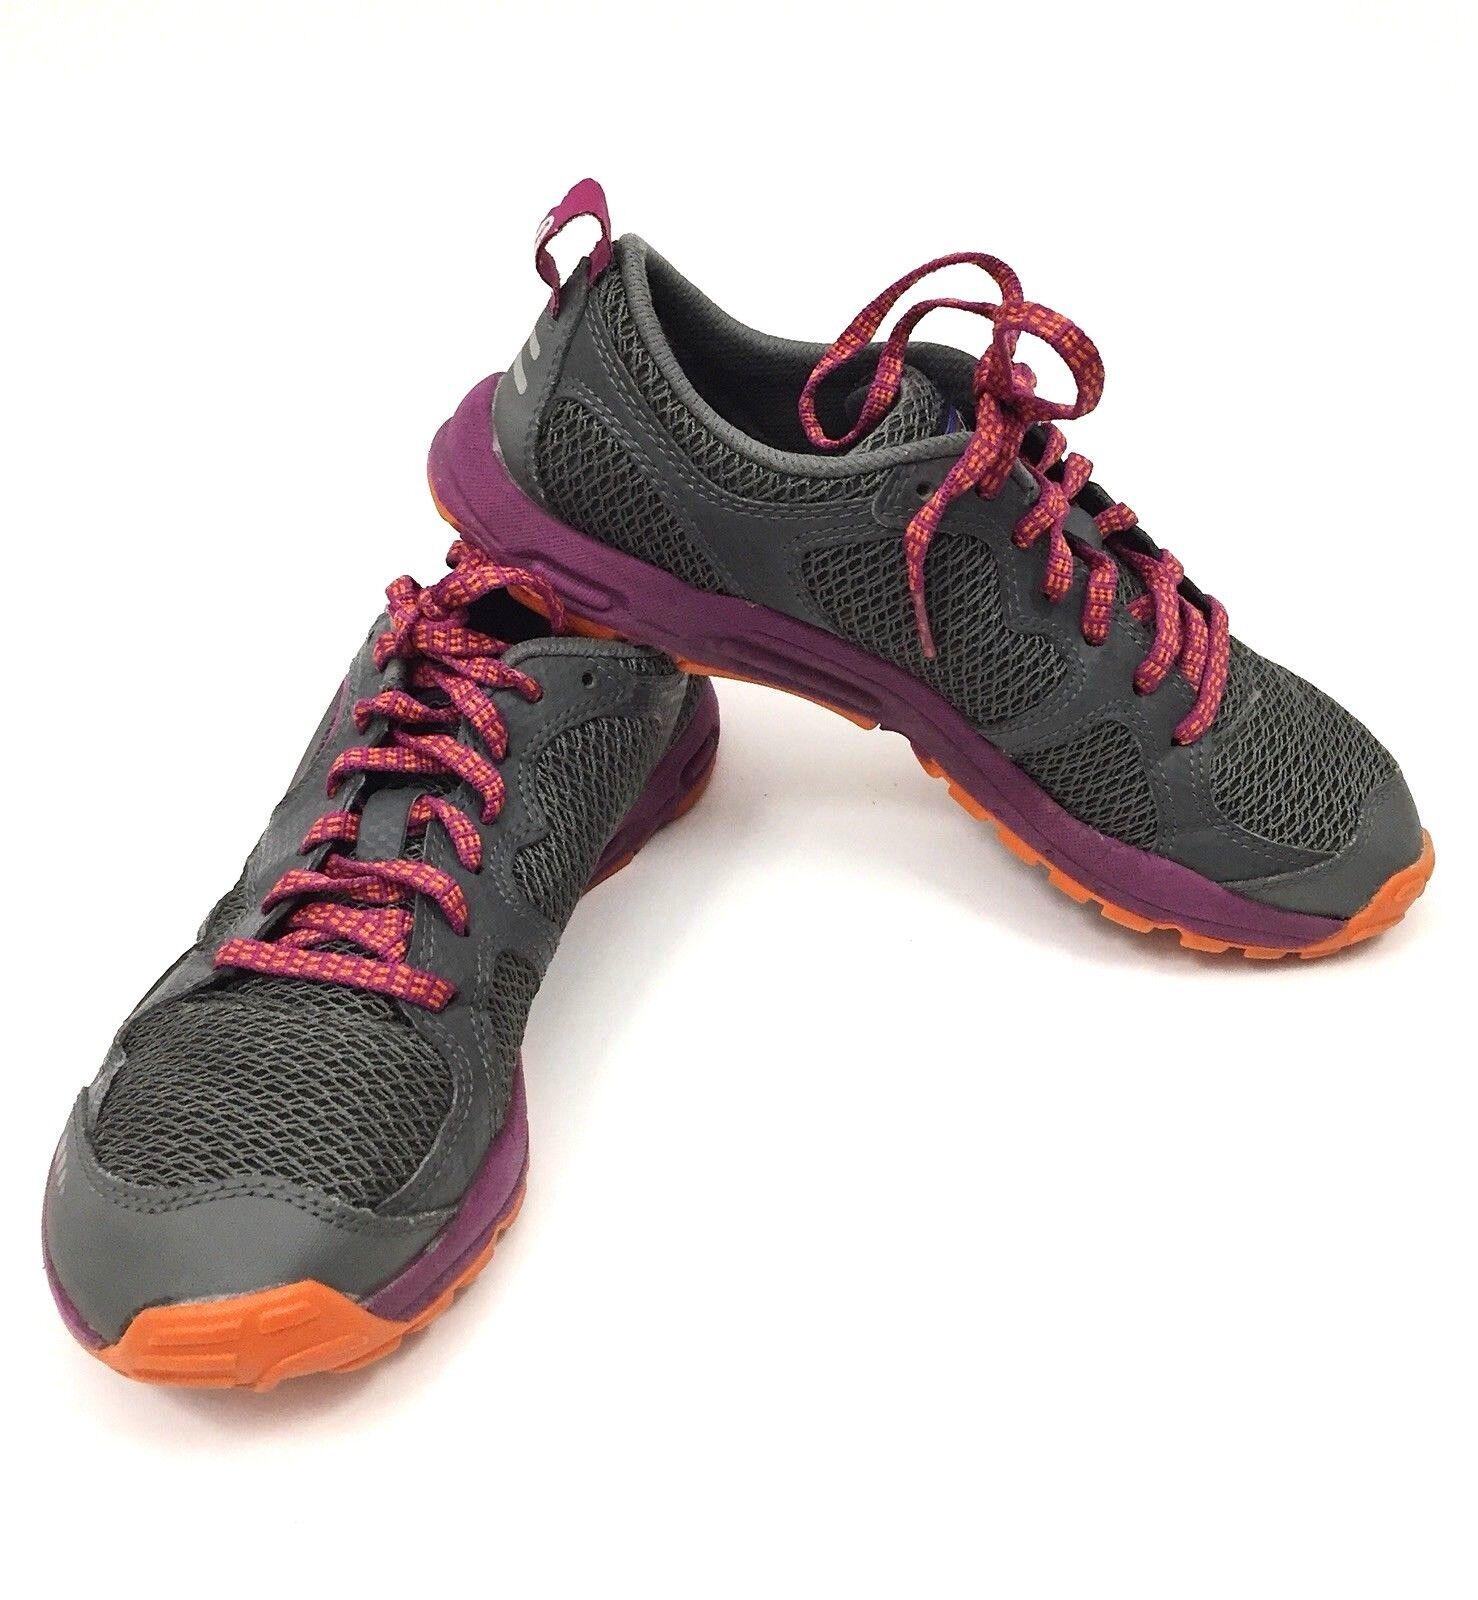 Patagonia EVERmore Womens Trail Running shoes Amaranth Tumeric Sz. 7 US